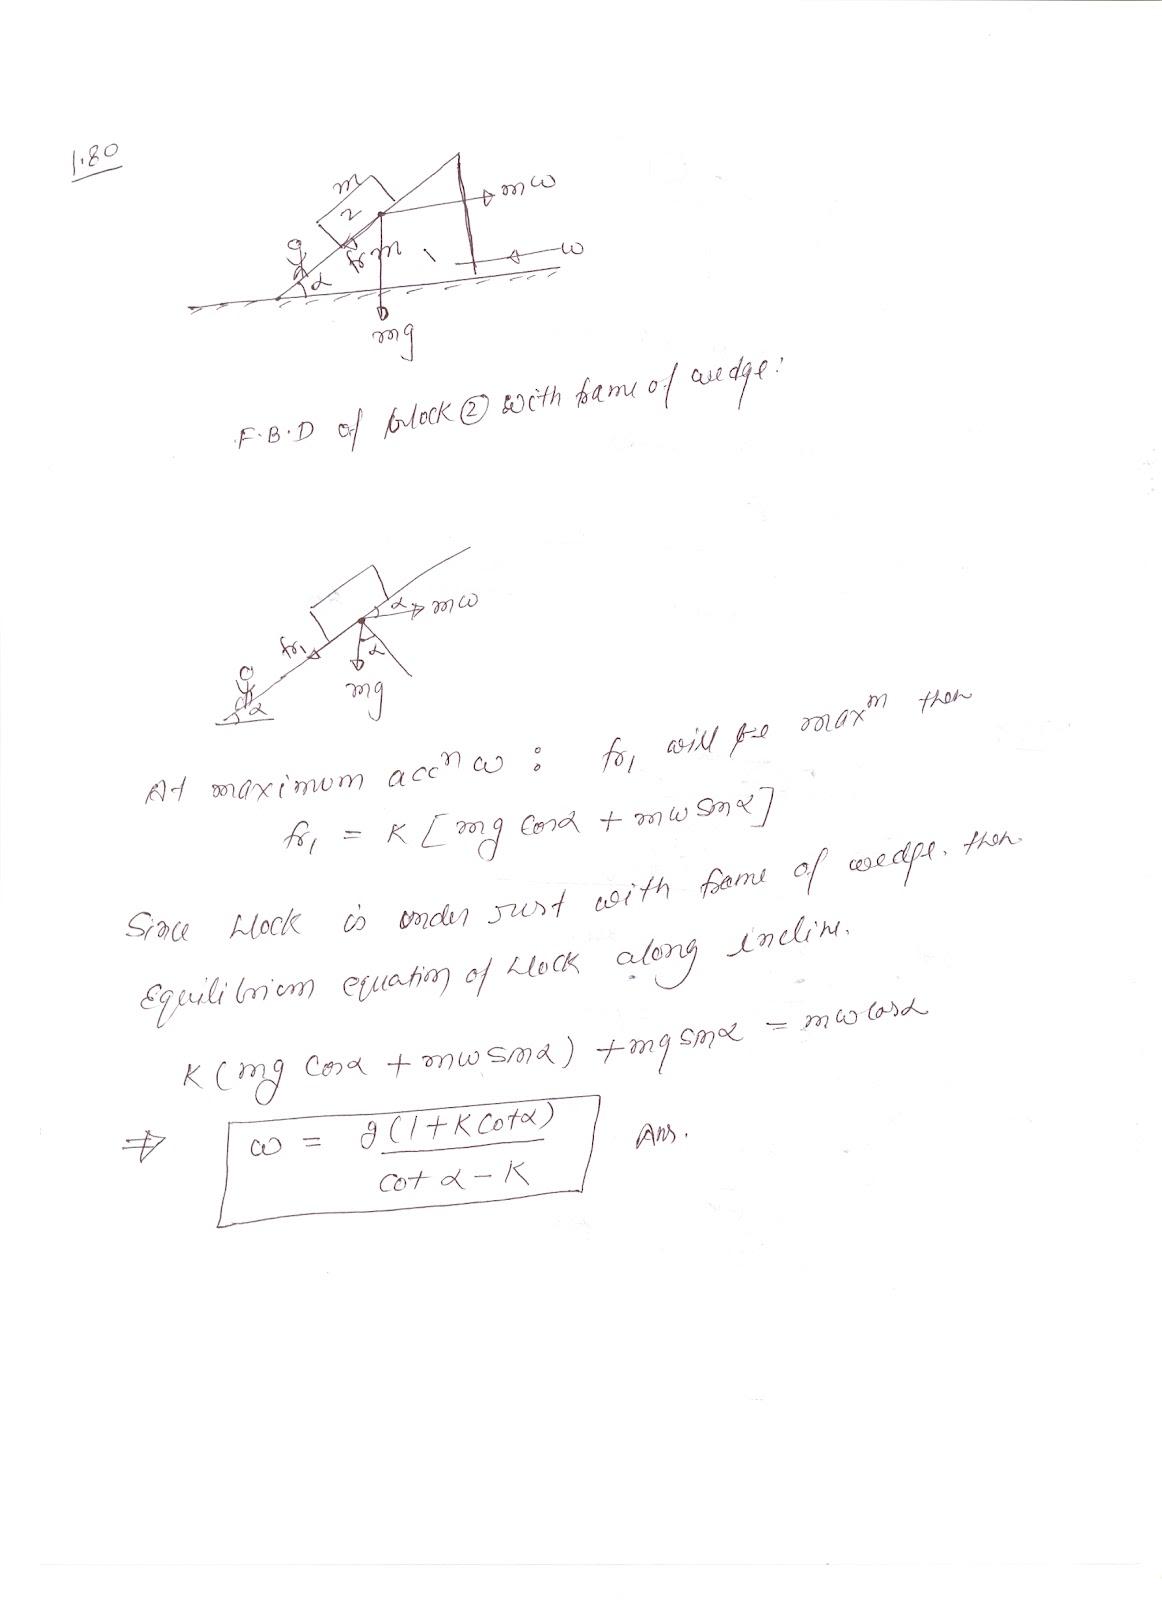 SOLUTIONS TO I E IRODOV BY RKH: problem 1.80